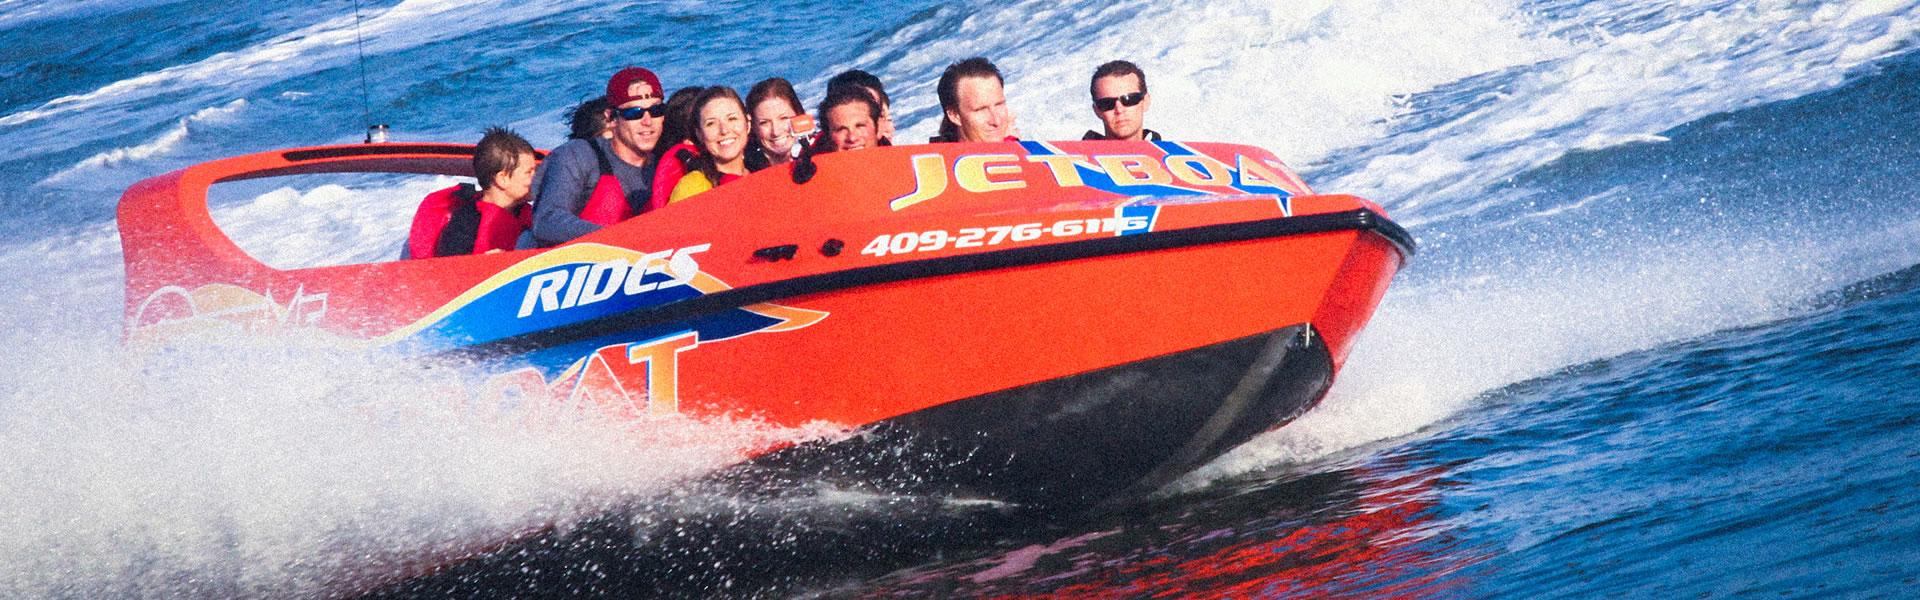 Galveston Water Adventures Jet Boat Ride